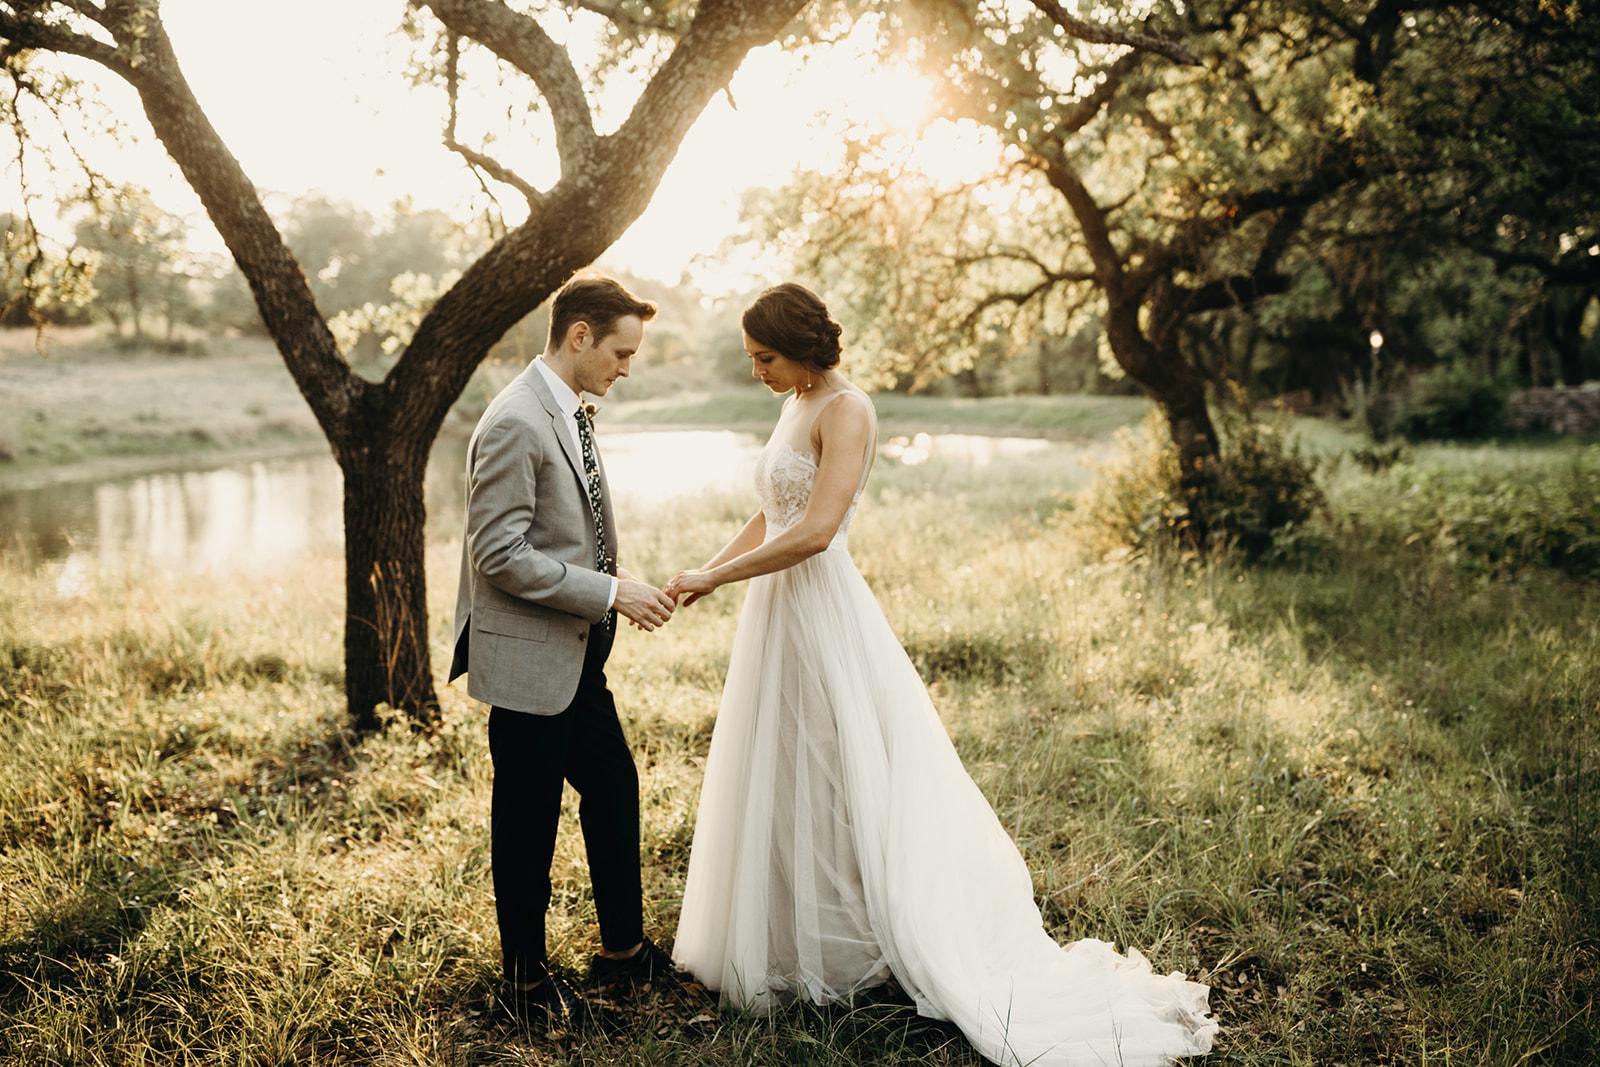 austin-wedding-lindsey-bryce-515.jpg